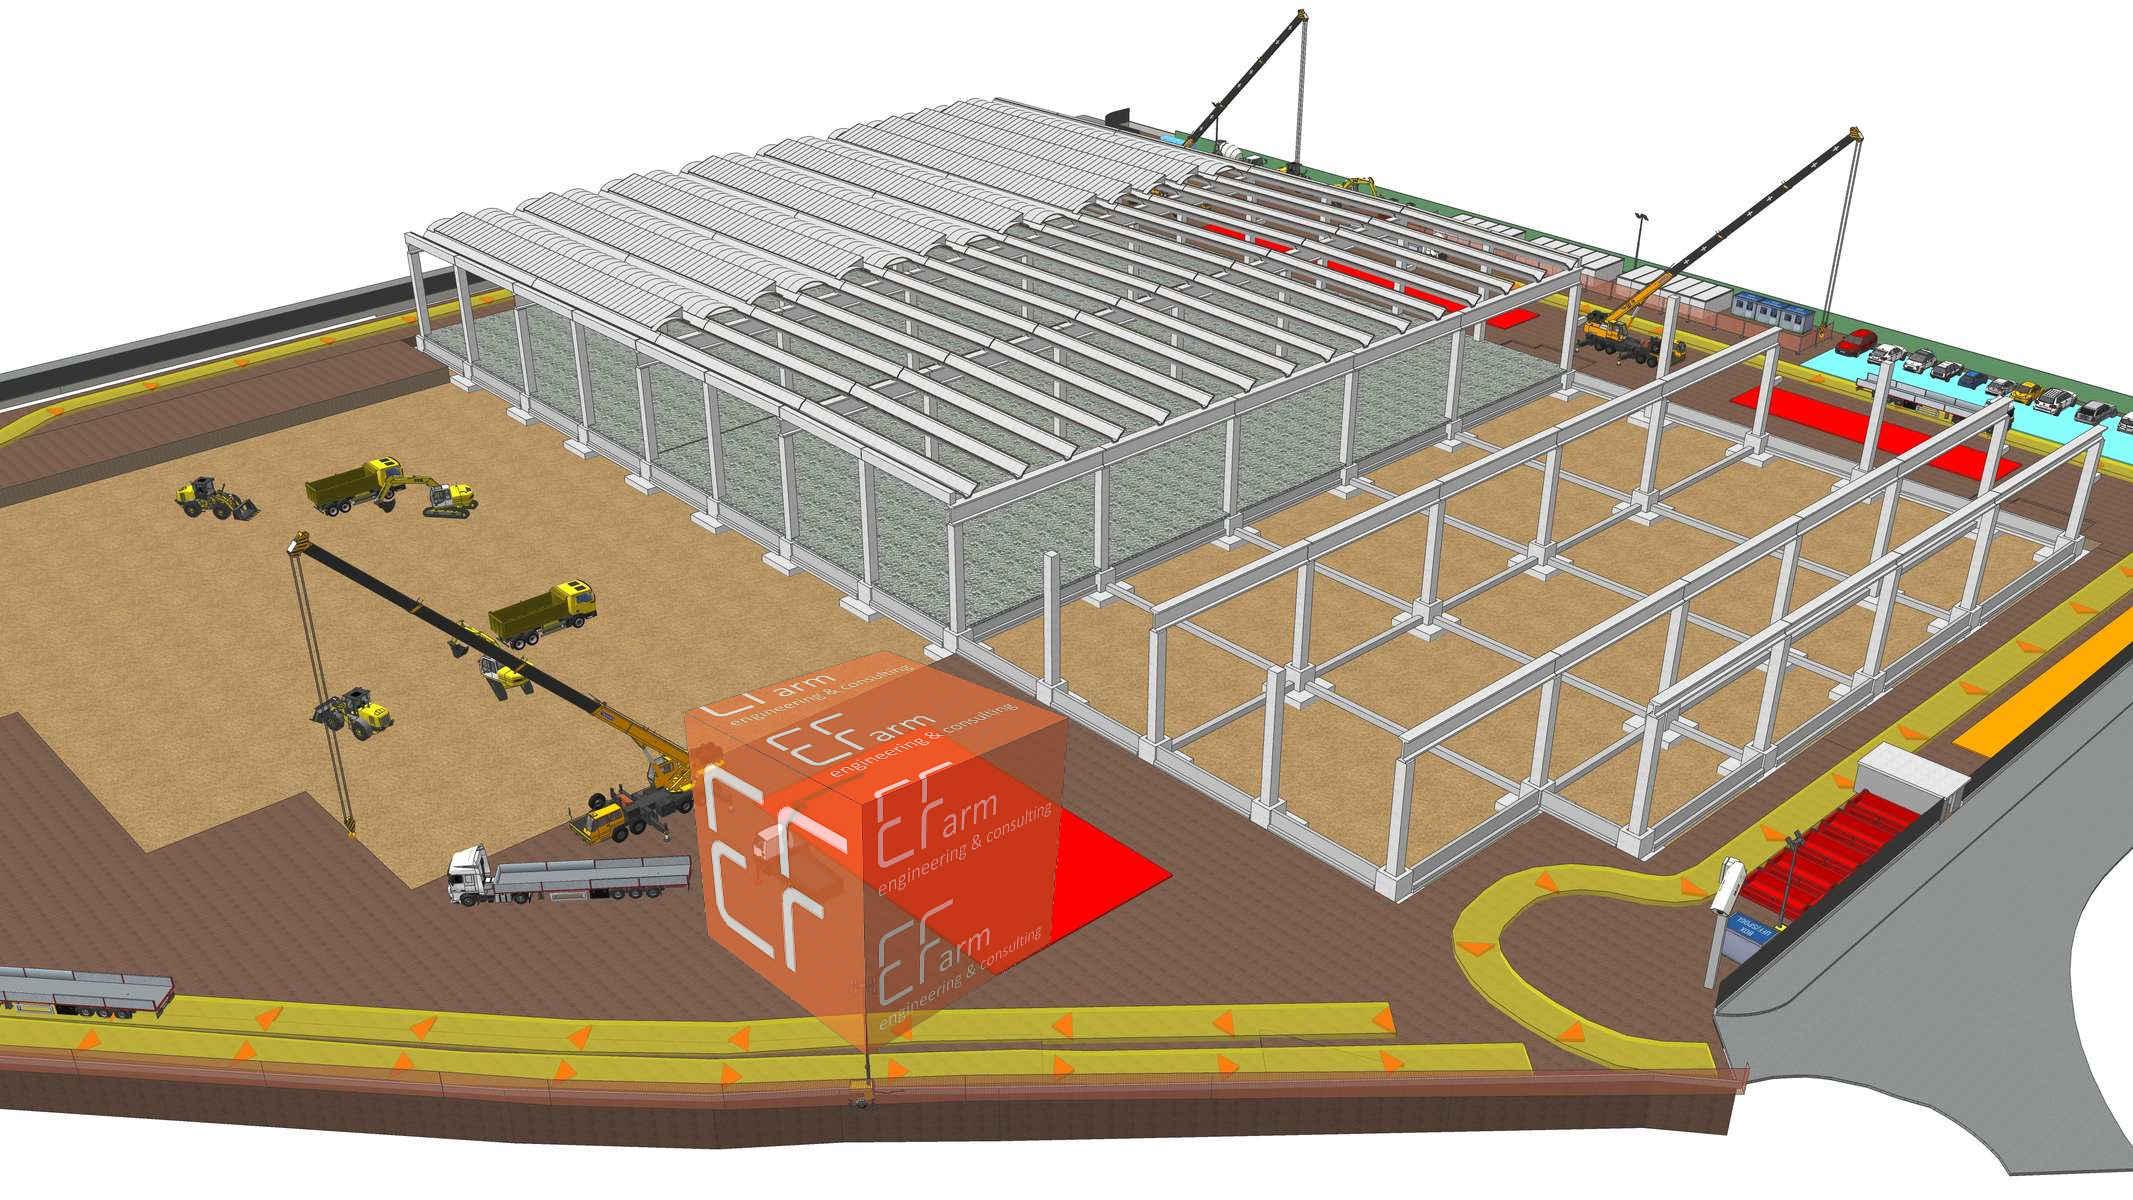 BIM Centro Logistico E-Farm engineering & consulting